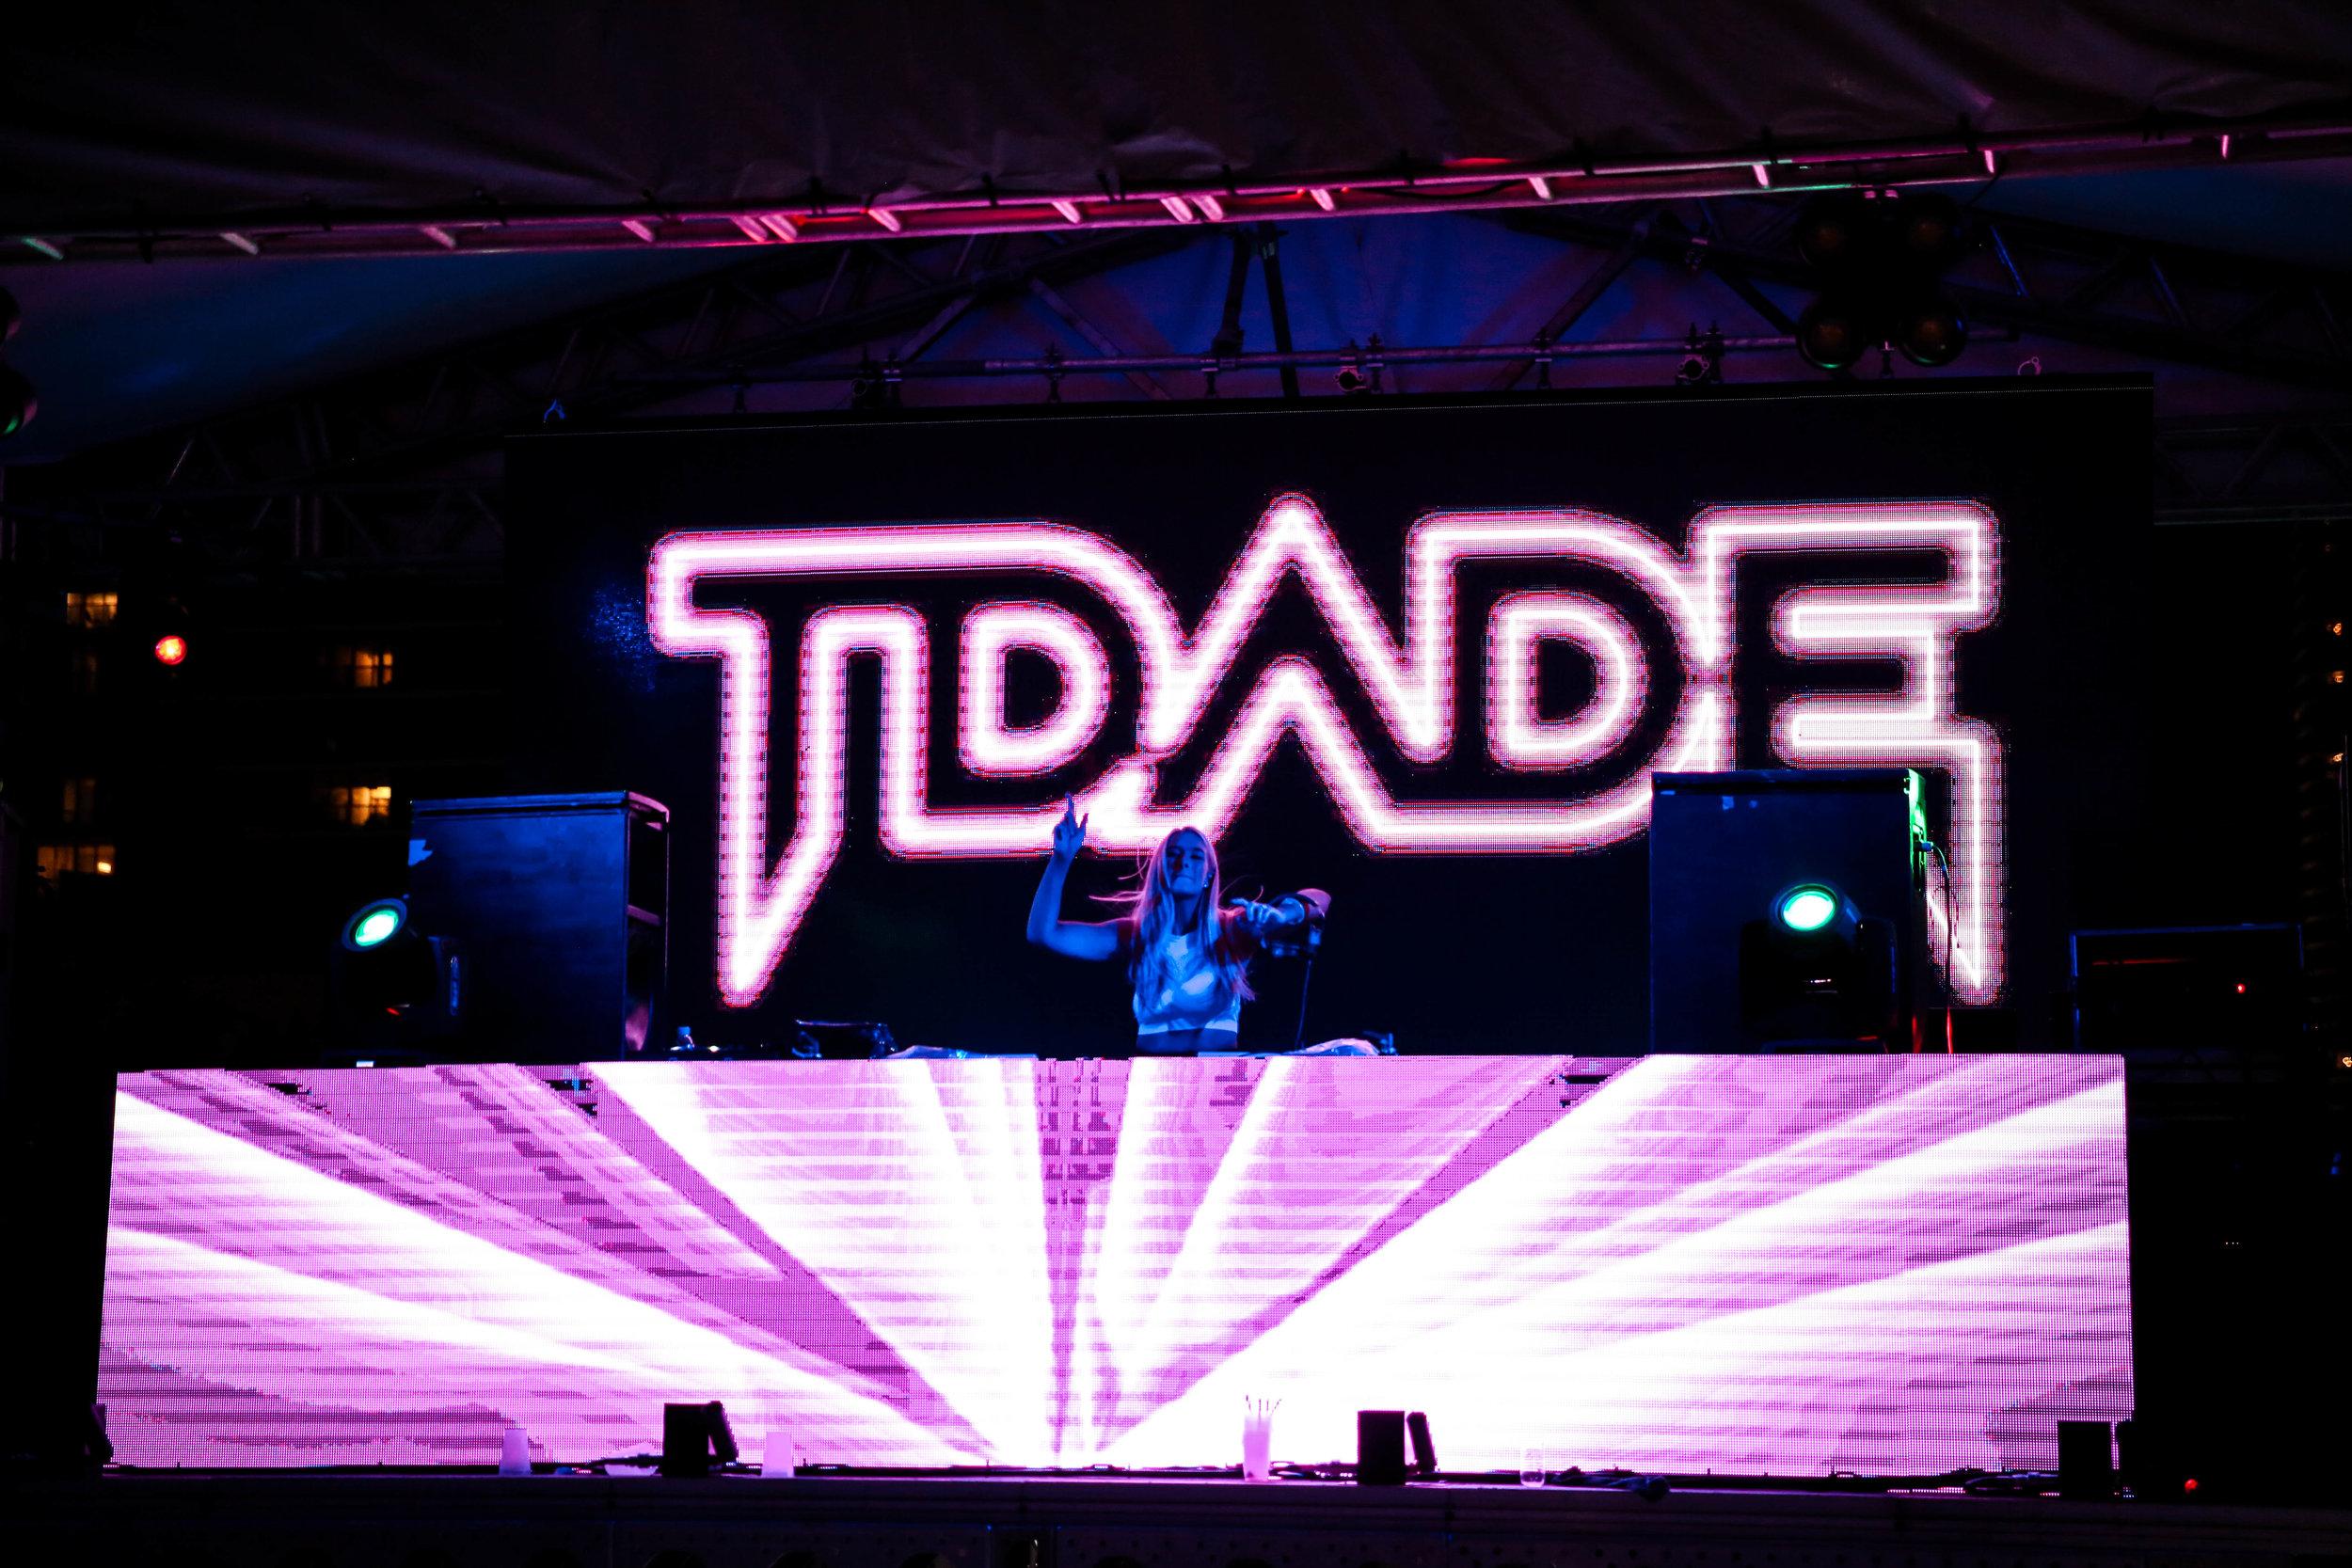 1 - TDade SLS Brickell Miami FL Tricia Dade DJ T.Dade-0651 copy 2.jpg